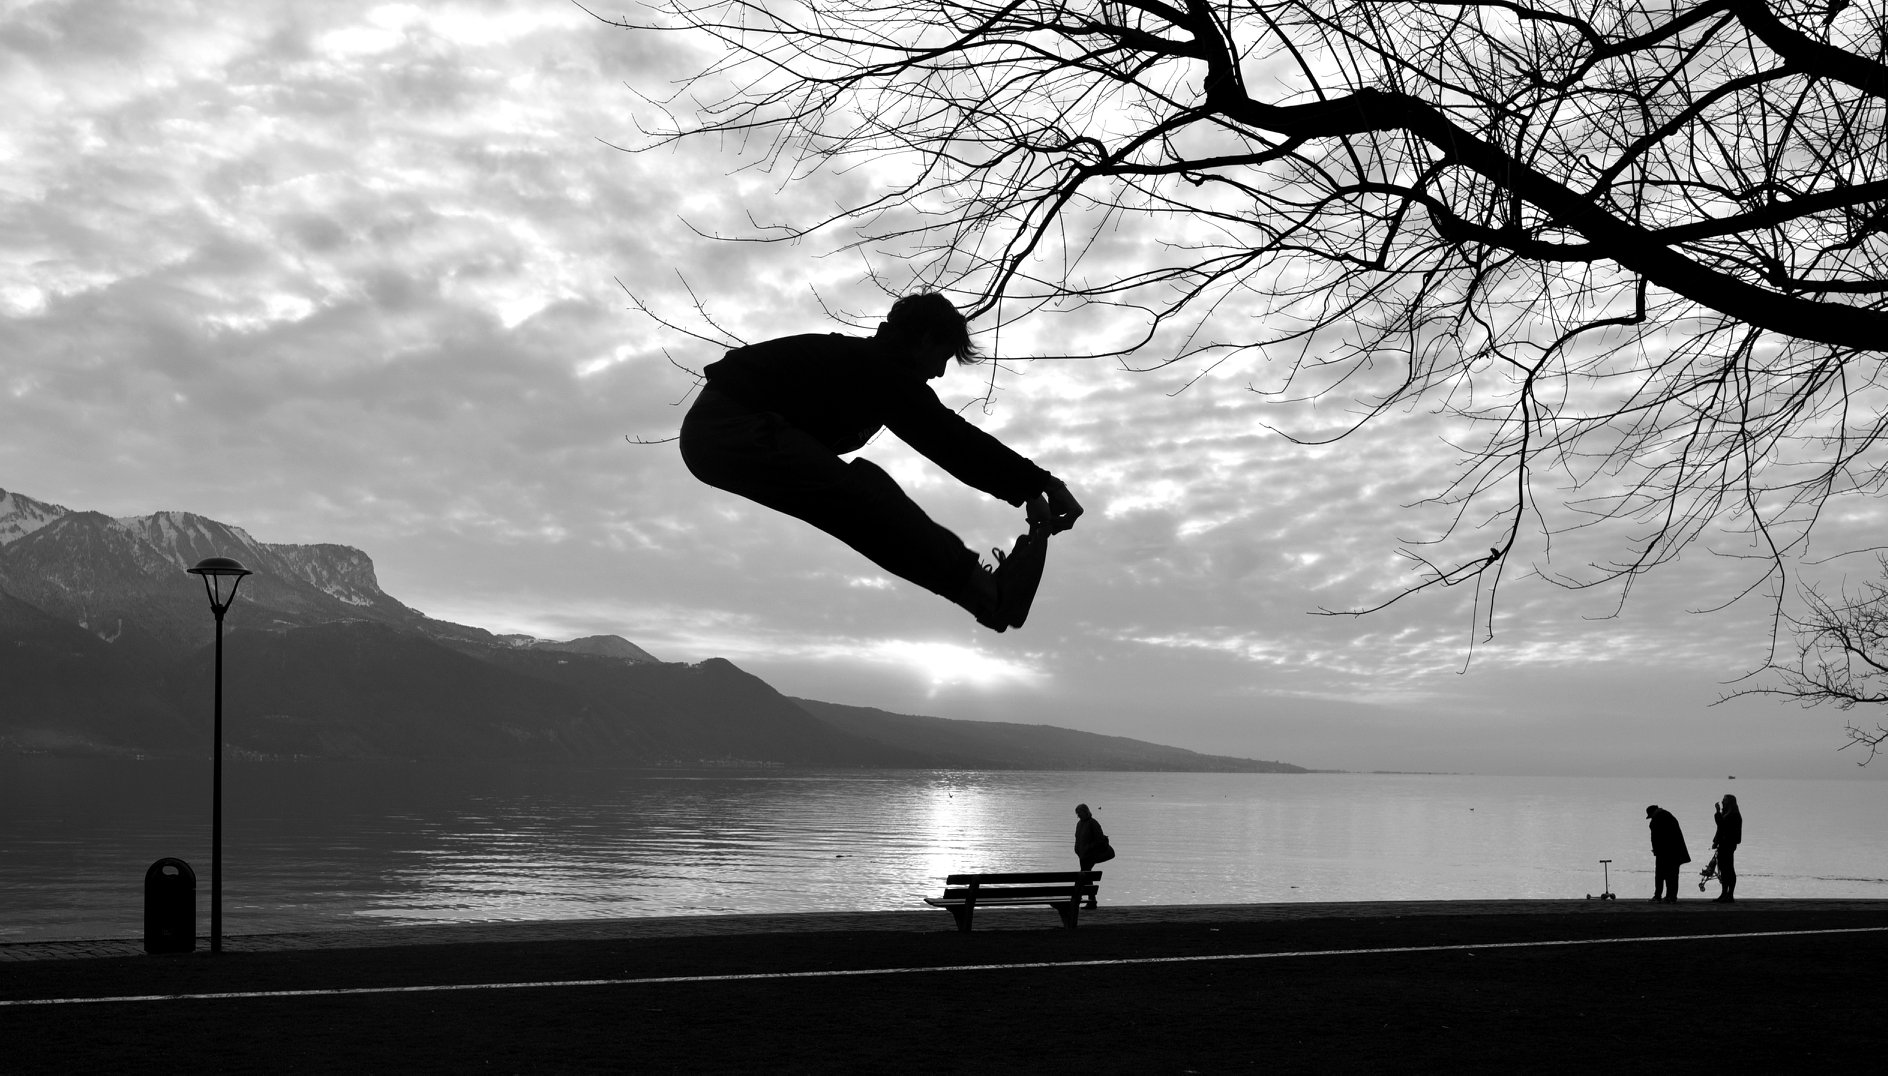 Vevey acrobatic highline trickline show funambule circus performance spectacle ecole suisse Slackline Lyell Grunberg.jpg